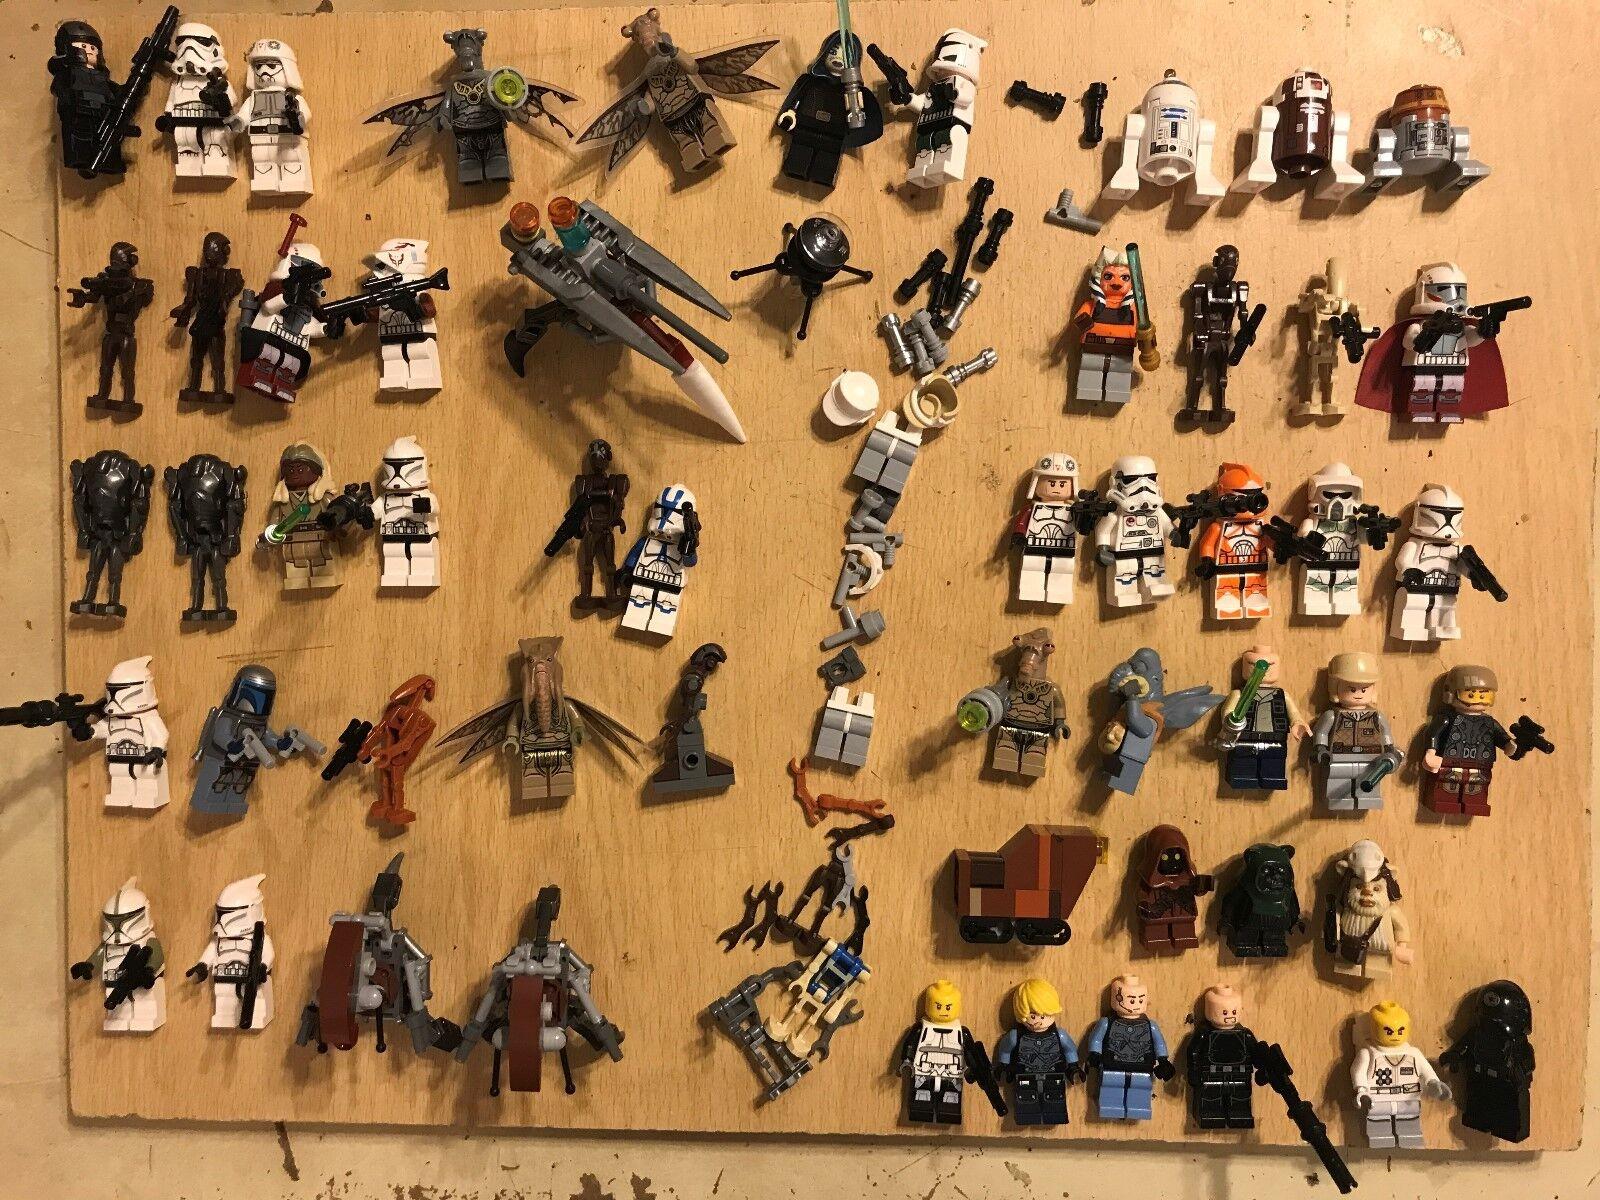 50 LEGO STAR WARS MINIFIGURES JOB LOT BUNDLE 75015 75016 75083 9488 75002 9491 +